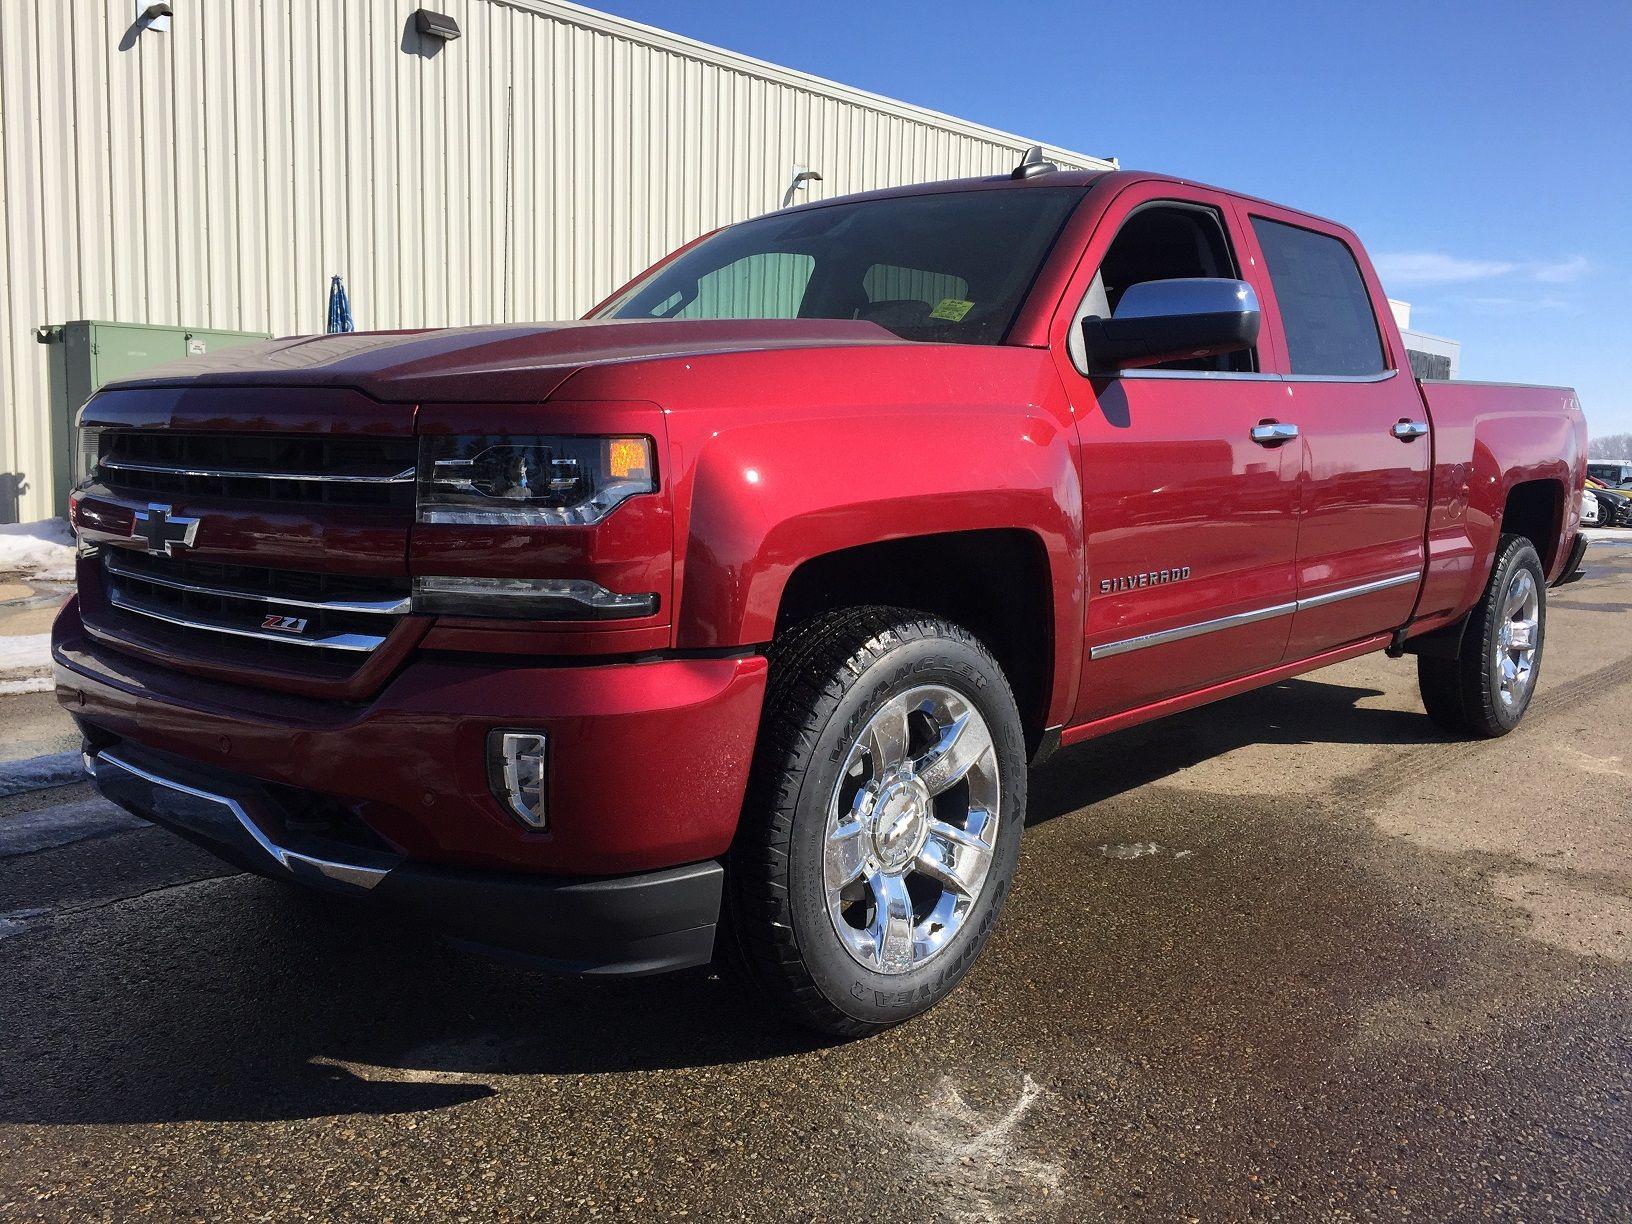 Red Hot 2018 Chevrolet Silverado 1500 Old Pickup Trucks Chevrolet Silverado 1500 Chevrolet Trucks